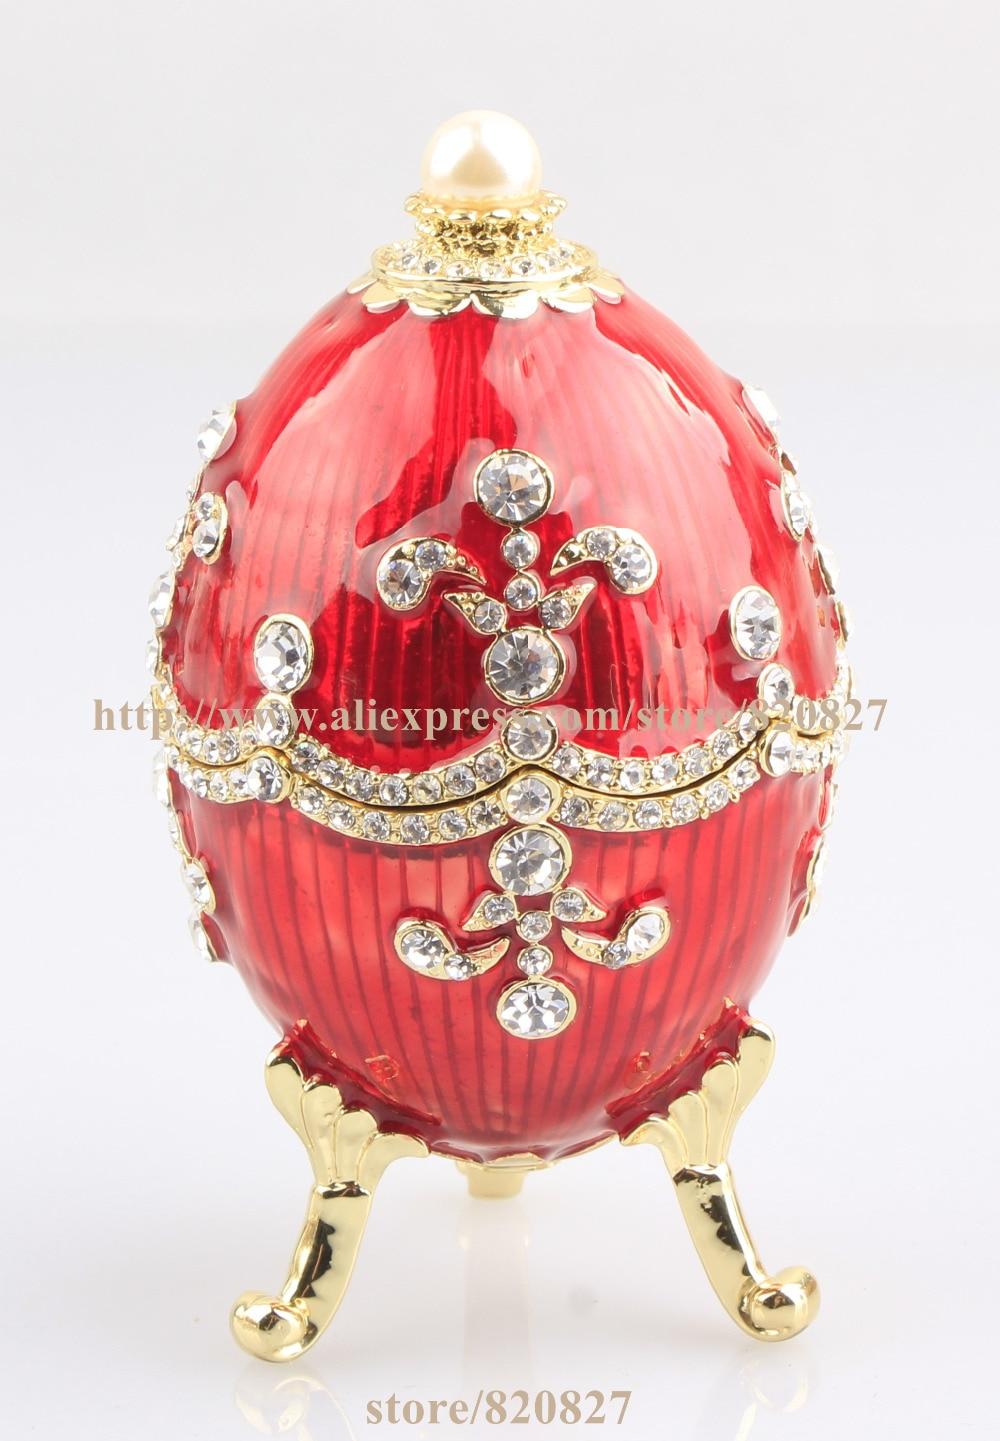 Faberge Egg Trinket Box Hand Made Gift Crystal Faberge Easter Egg Figurine Decor Vintage Russia Egg Magnet Craft beistle company mens easter egg whirls assorted